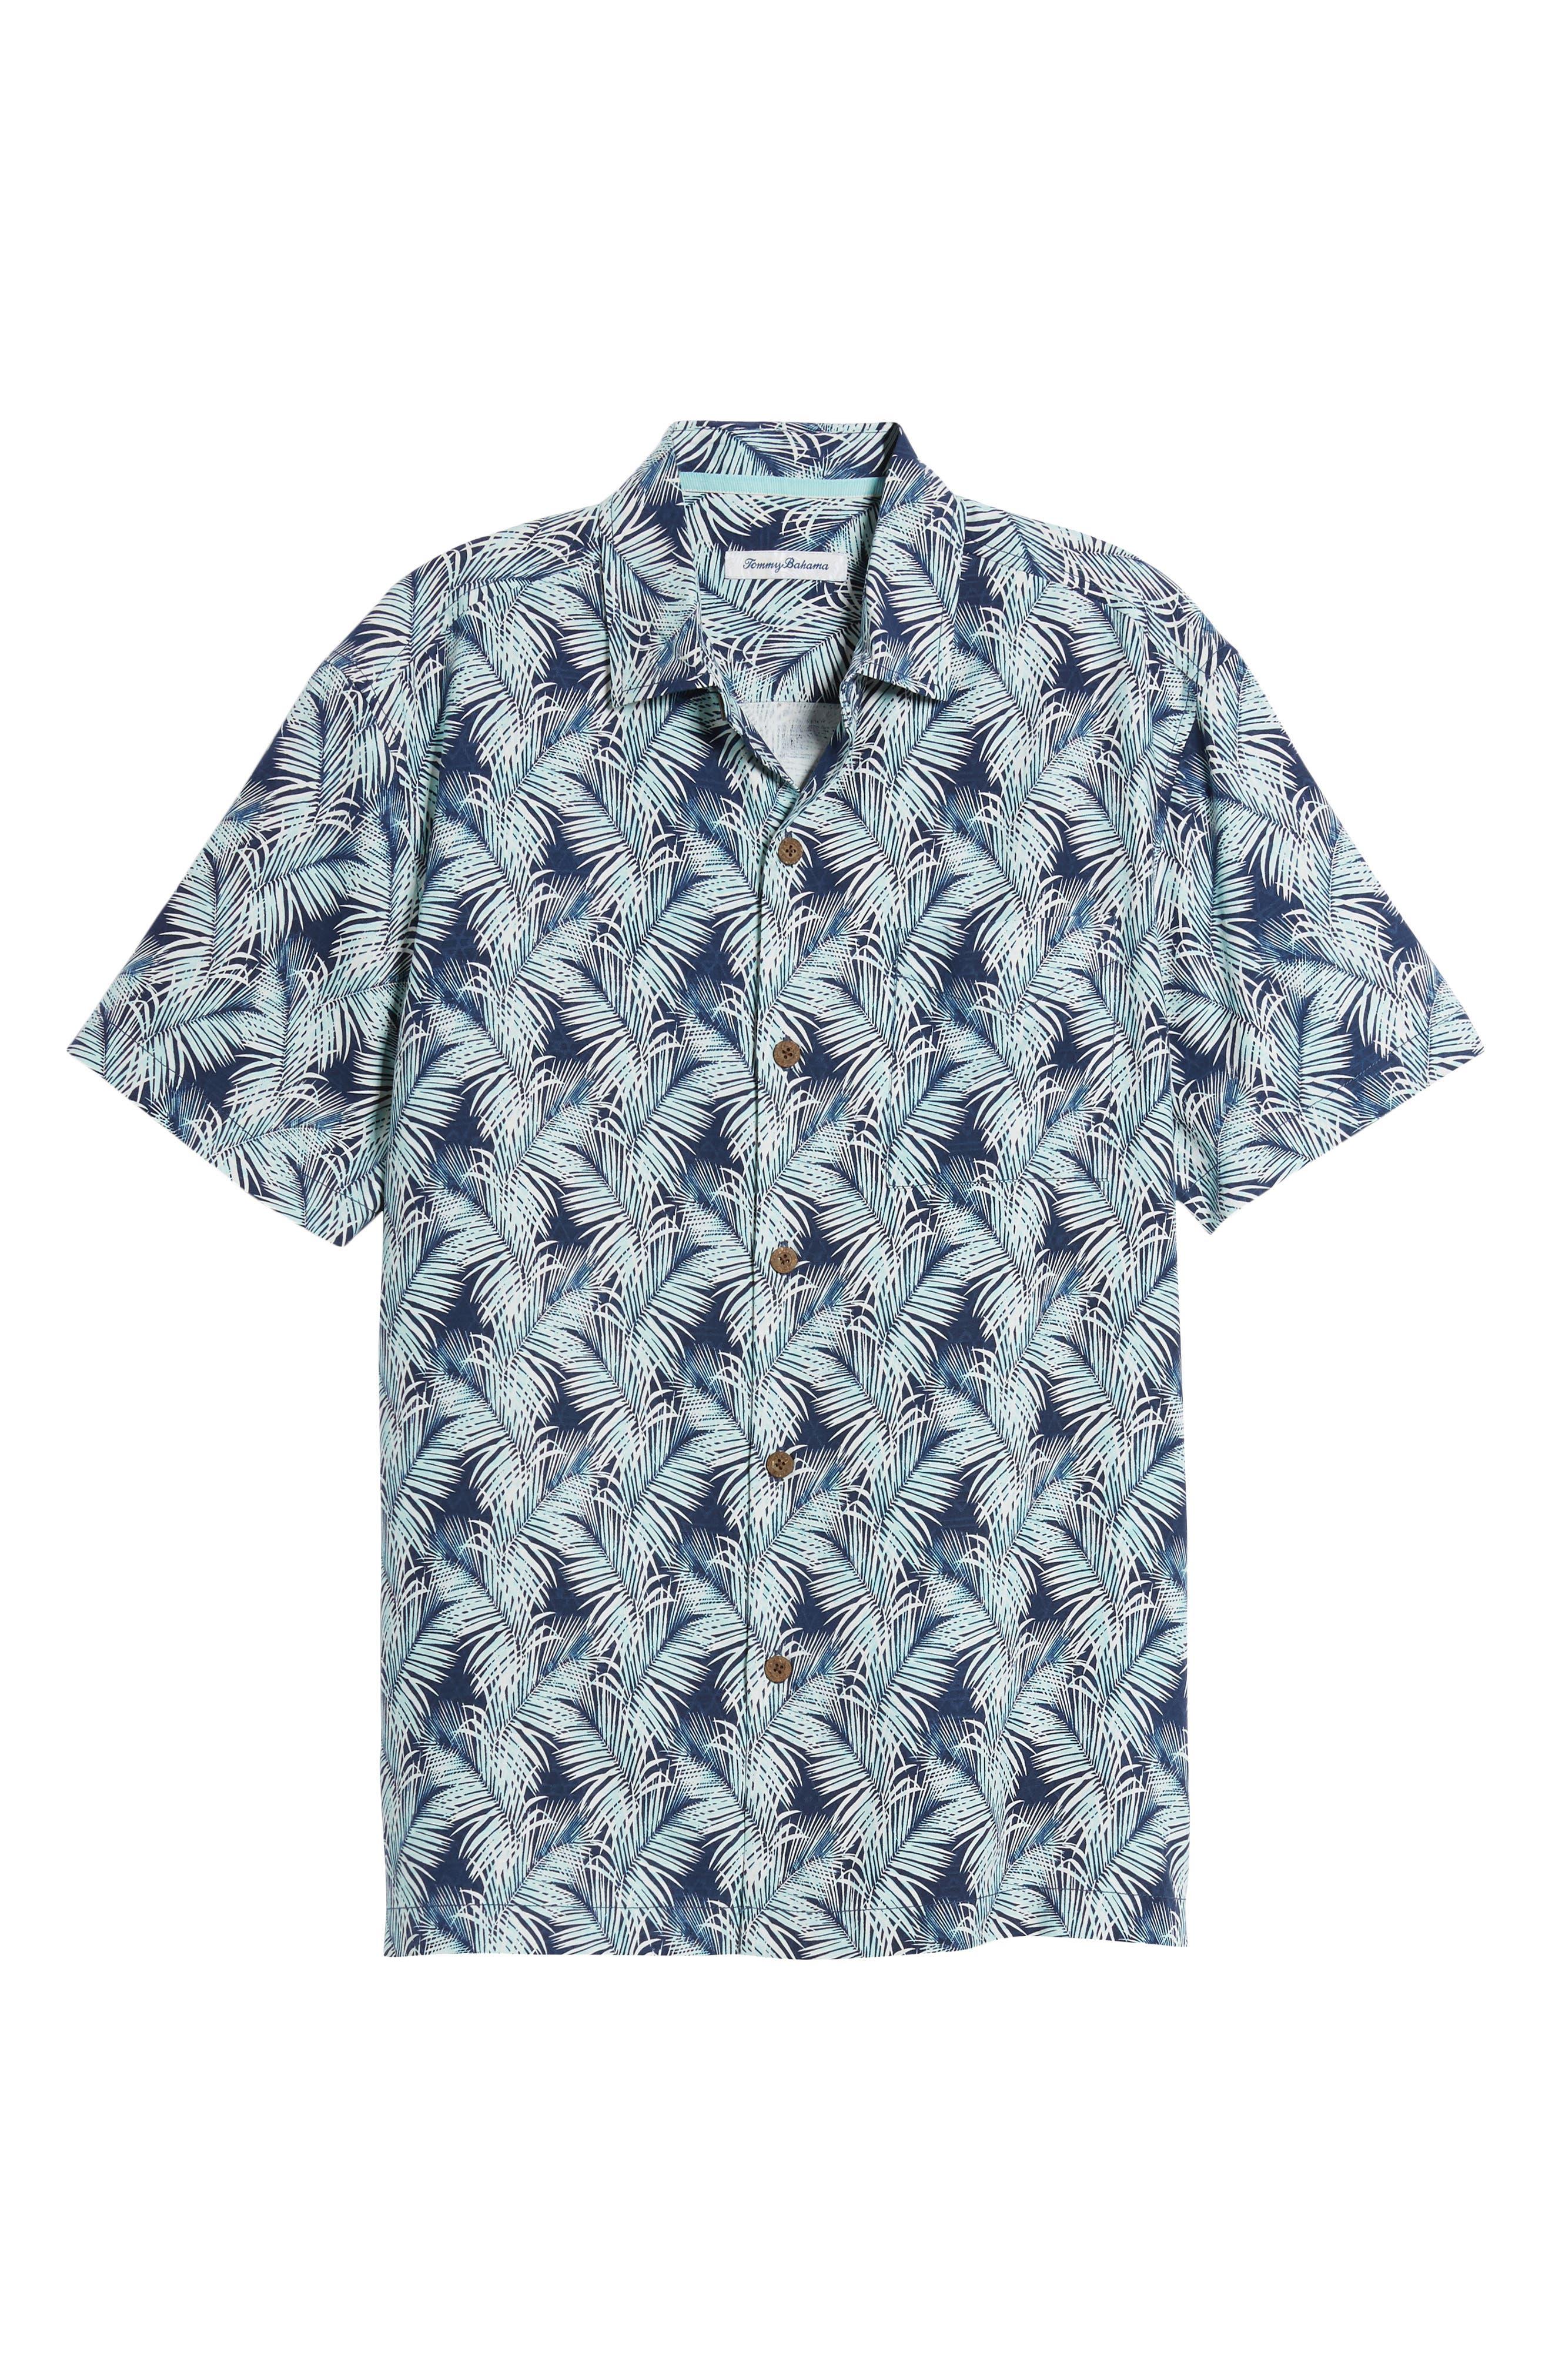 Palms of Tulum Silk Camp Shirt,                             Alternate thumbnail 6, color,                             Ocean Deep